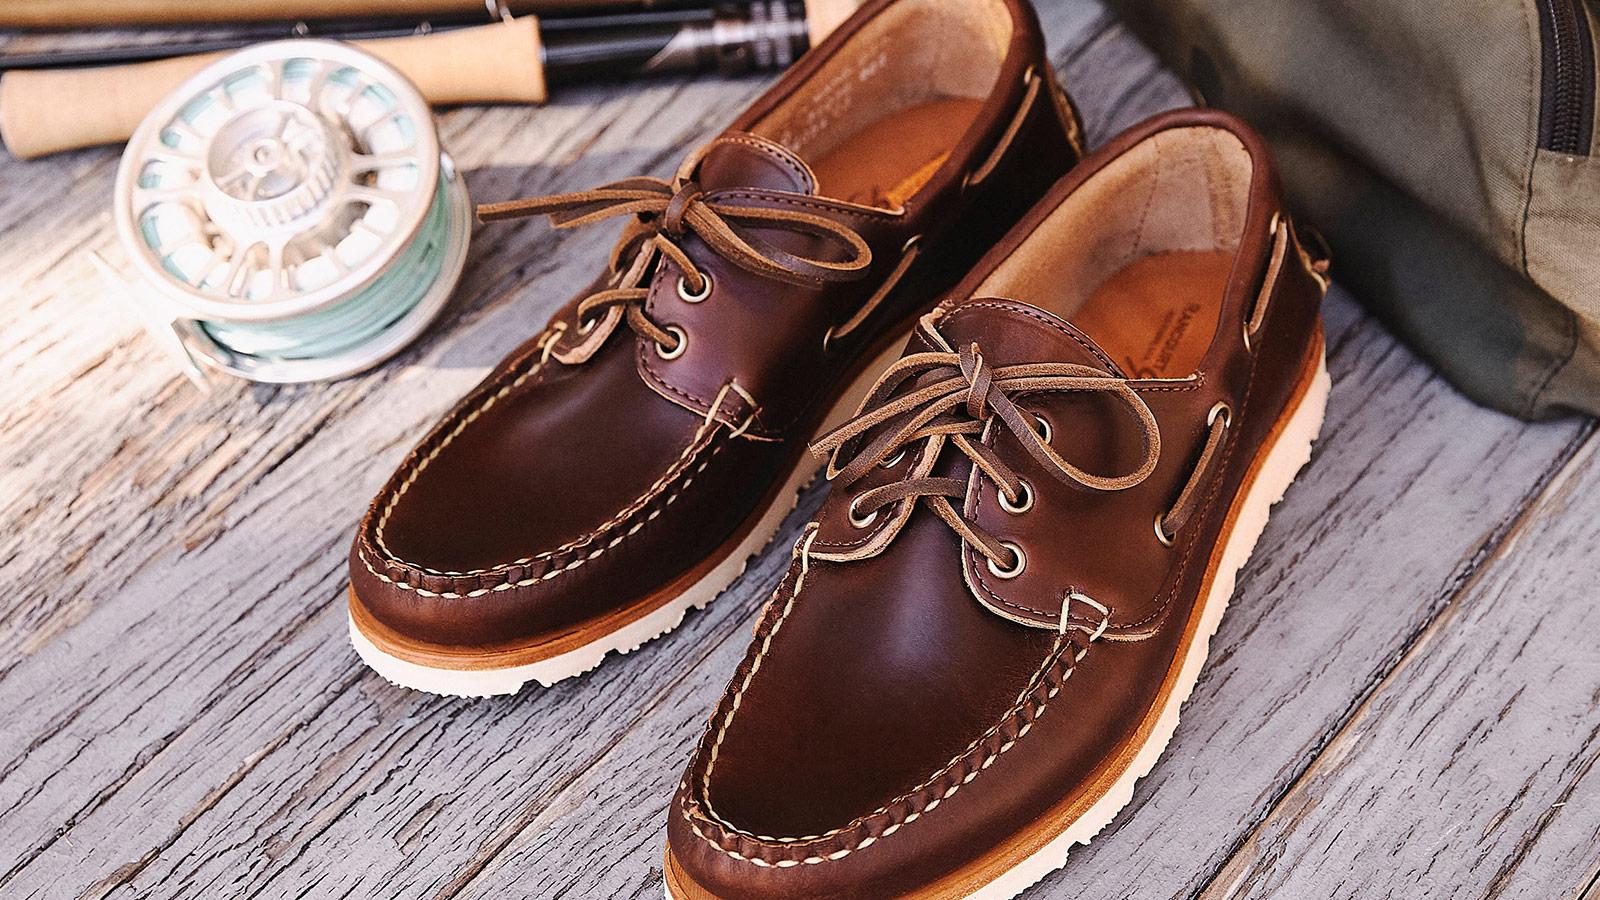 Huckberry x David Coggins Boat Shoe